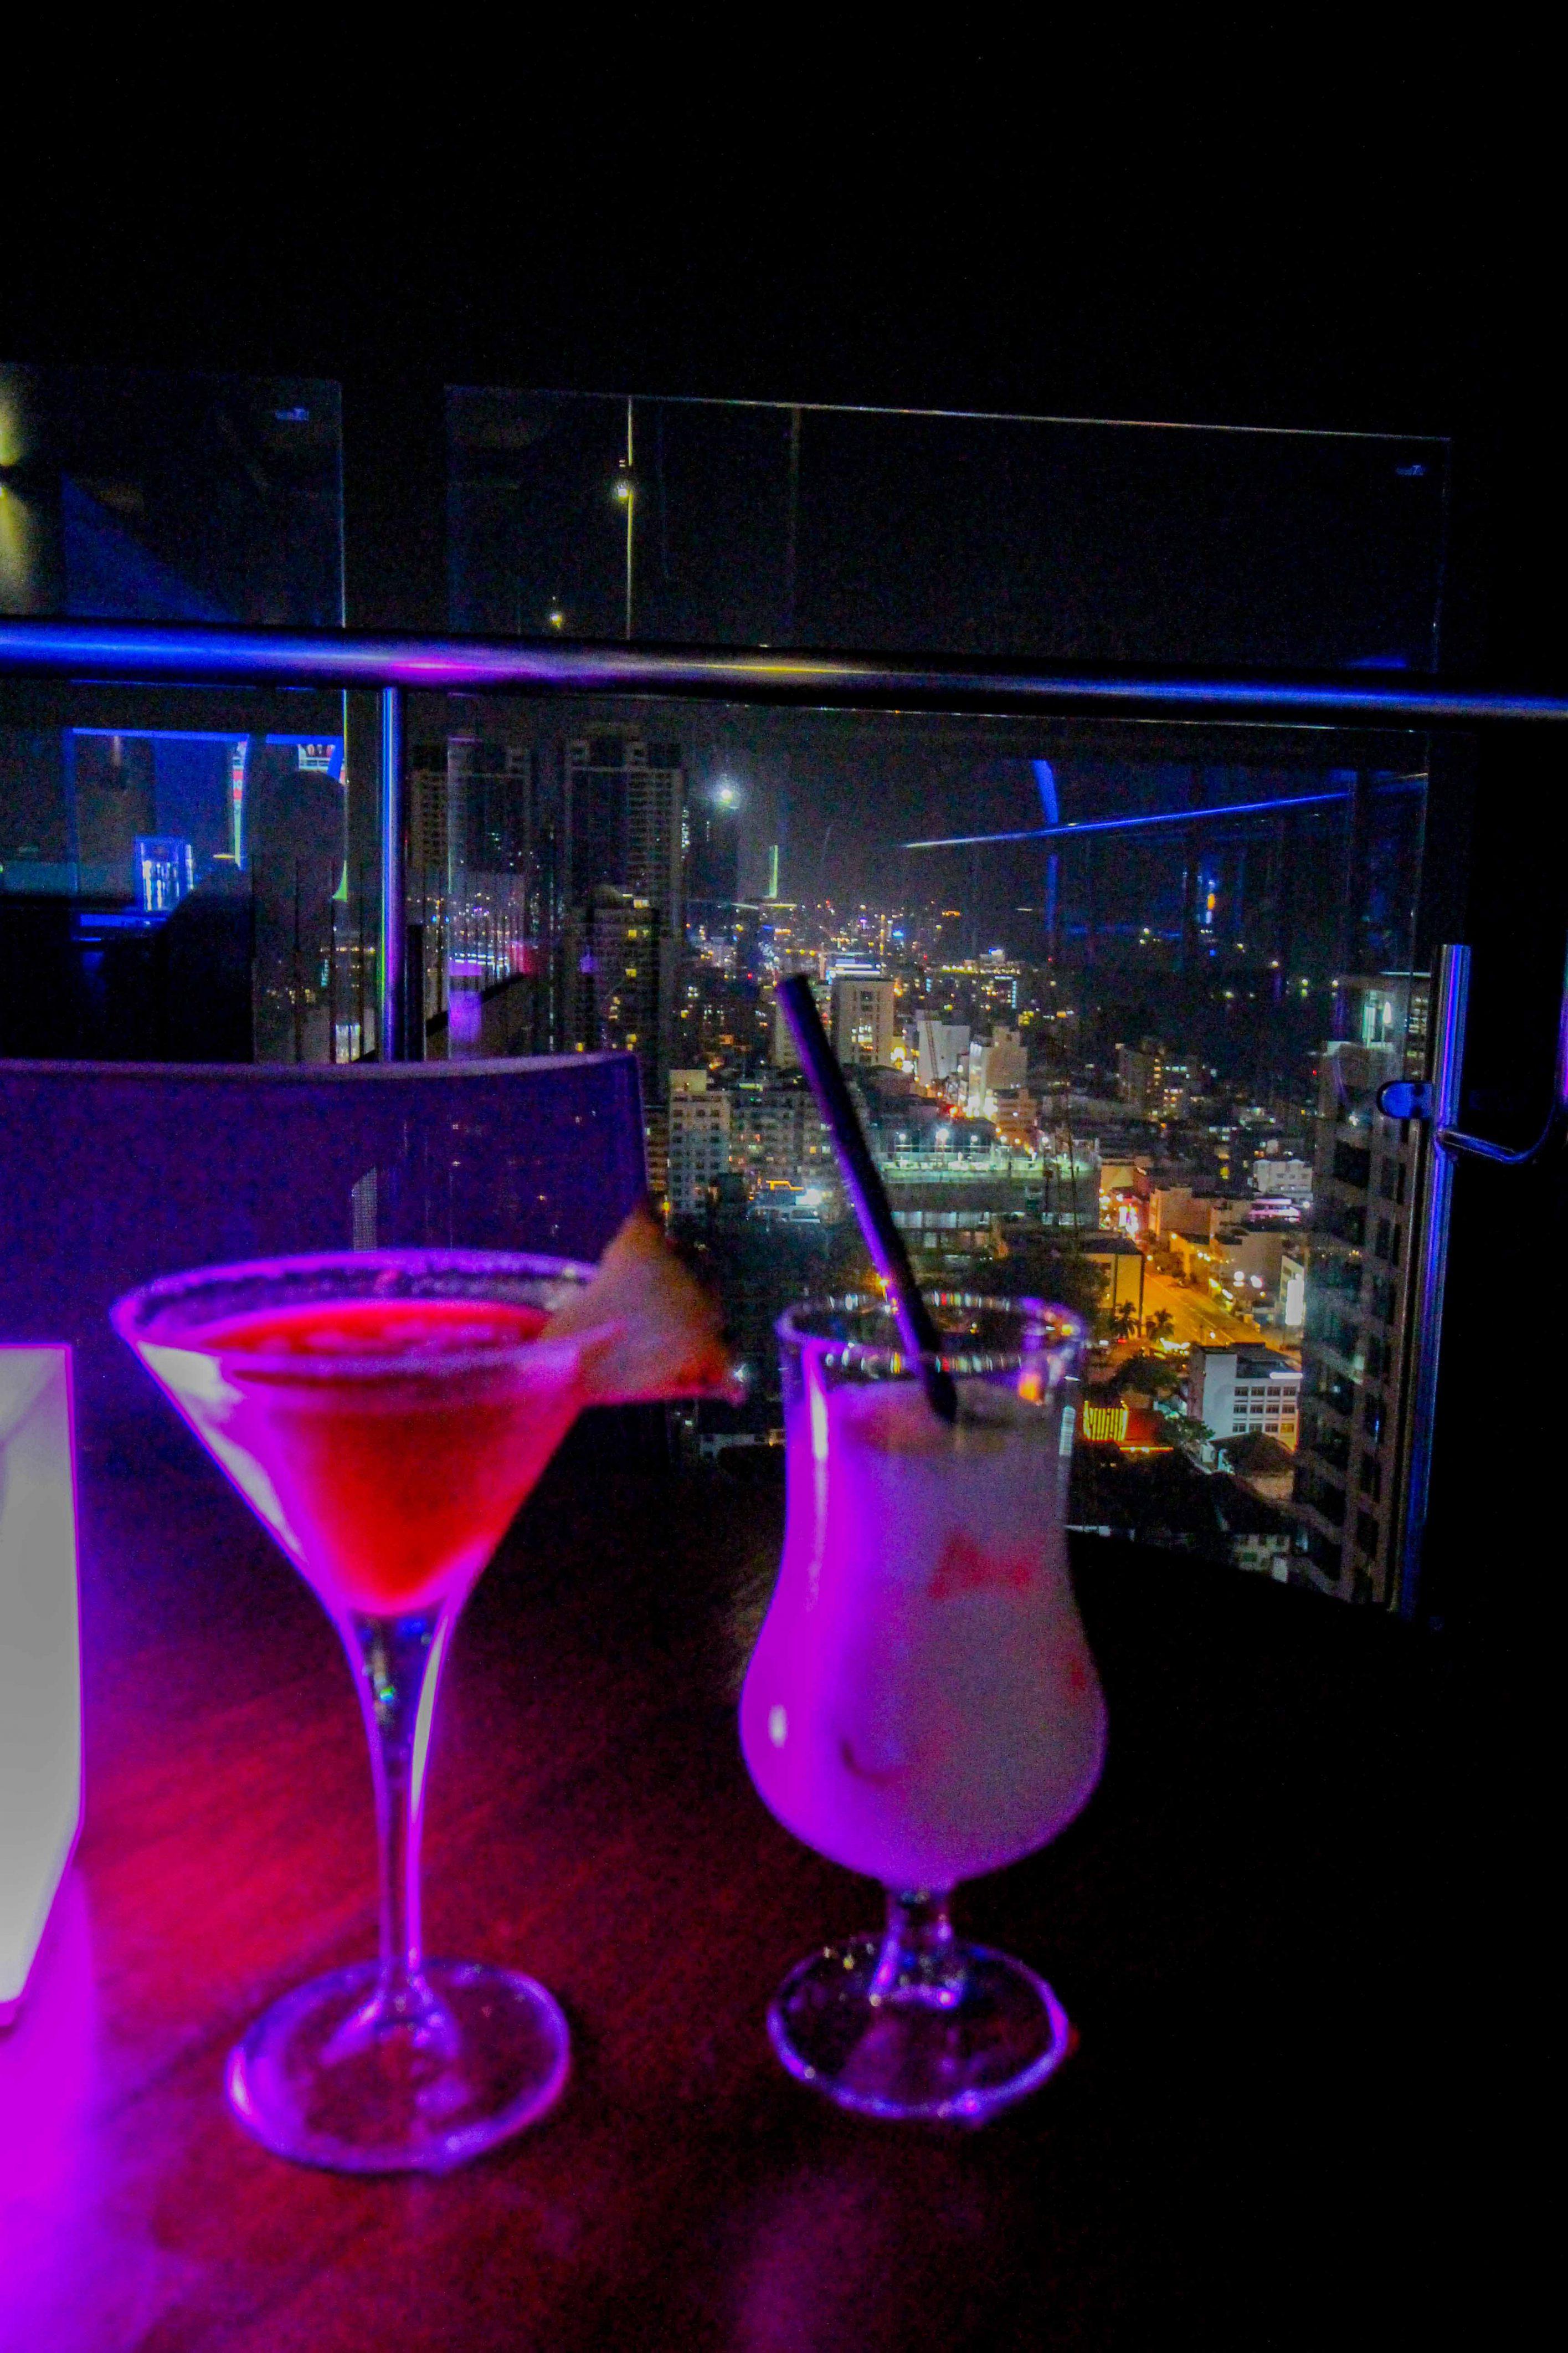 Rooftop Bar Colombo beste Cocktails Skyline Mövenpick Colombo Hotel Reiseblog Brinisfashionbook bestes Hotel Sri Lanka